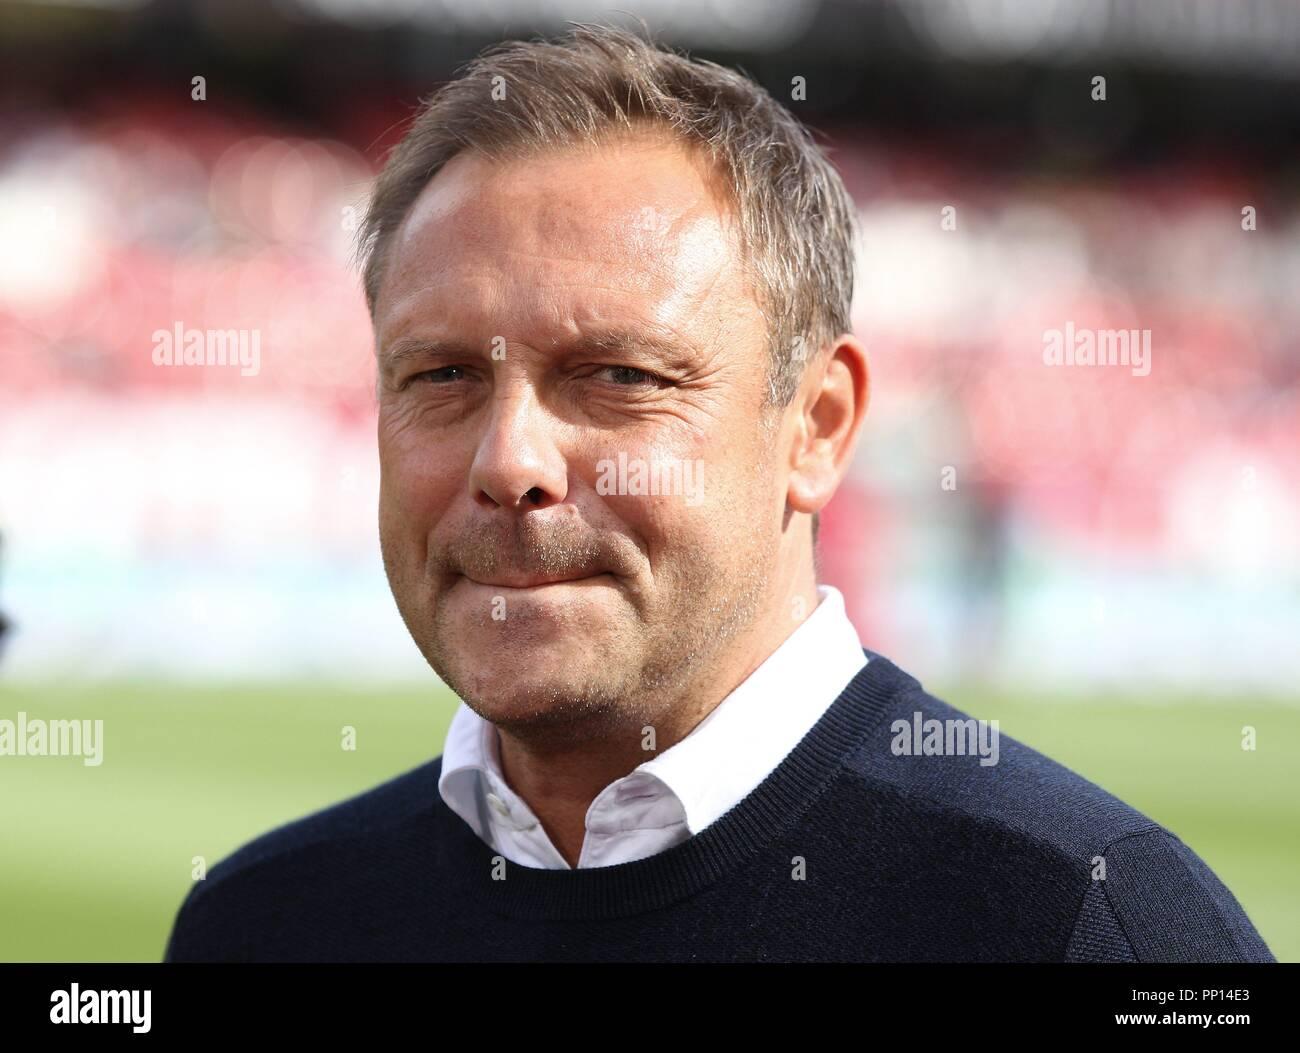 firo: 22.09.2018 Fuvuball, Football: 1.Bundesliga 1.FC Nvºrnberg - Hanover 96, coach Andre Breitenreiter, Hanover, 96, Portrait | usage worldwide Stock Photo